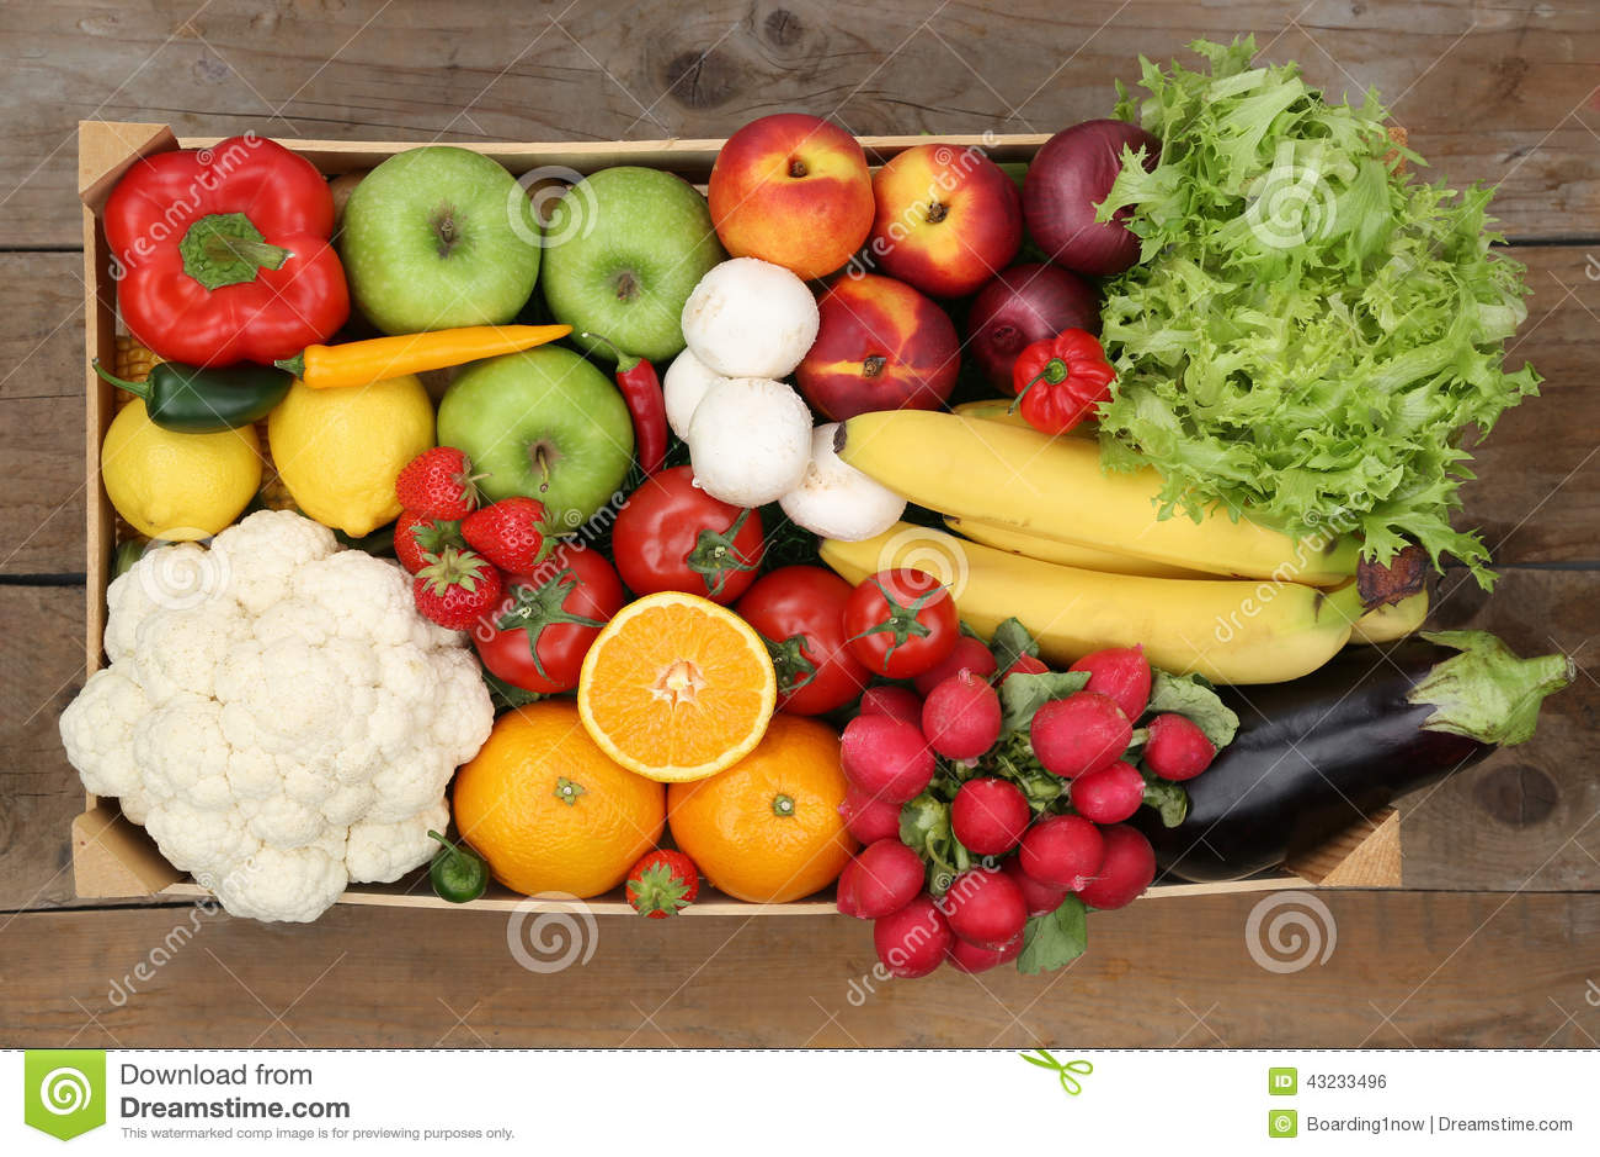 blocks fruit market fruit platter ideas